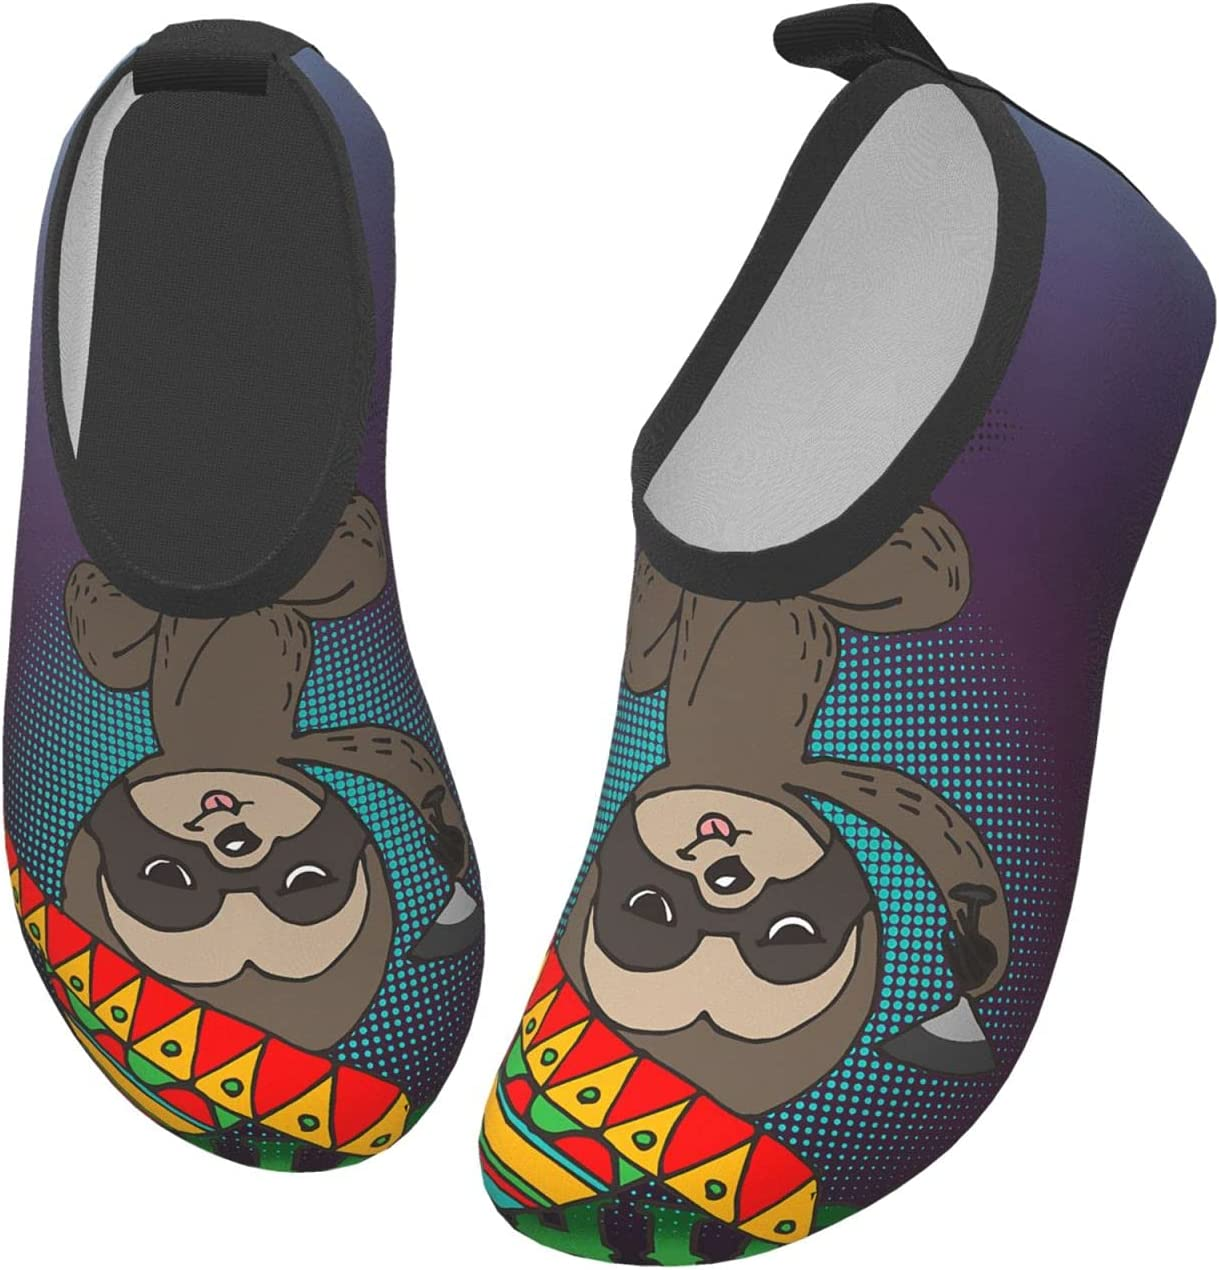 wobzfrok Lets Get Slothed Cinco De Mayo Kids Water Shoes Girls Boys Toddler Non-Slip Quick Dry Aqua Socks for Beach Swim Walking 28/29